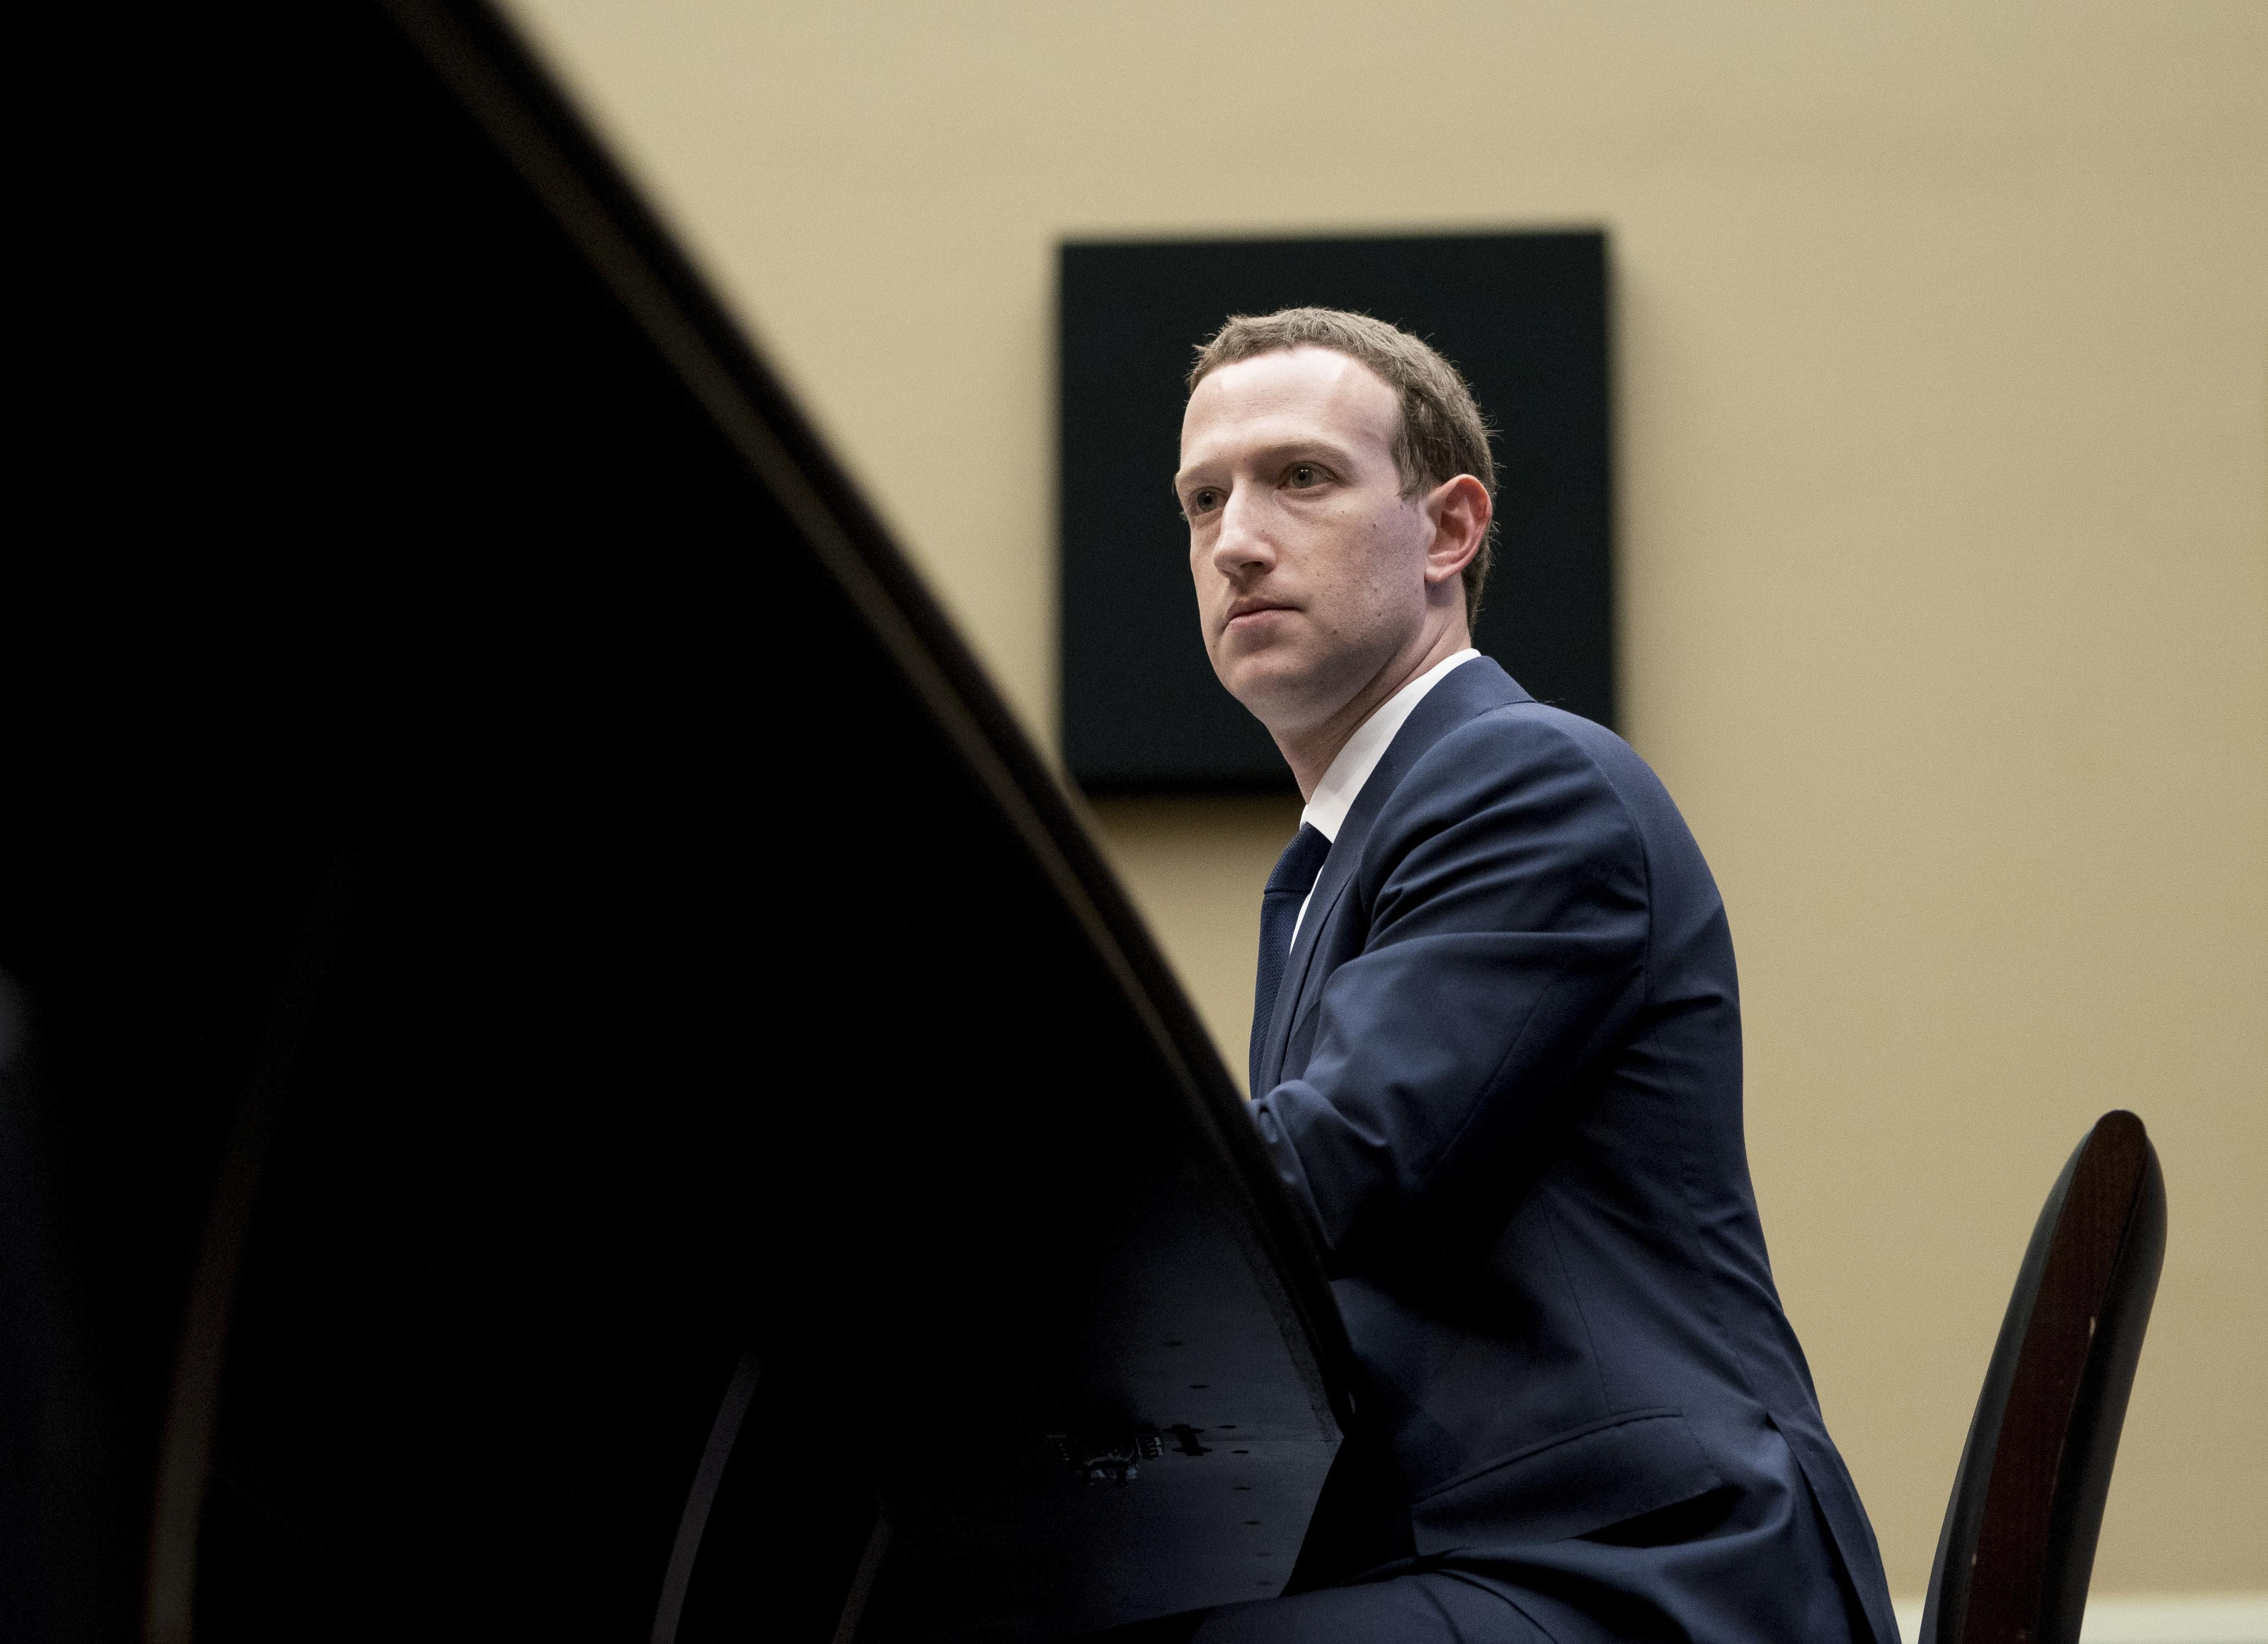 Mark Zuckerberg's mind-reading madness